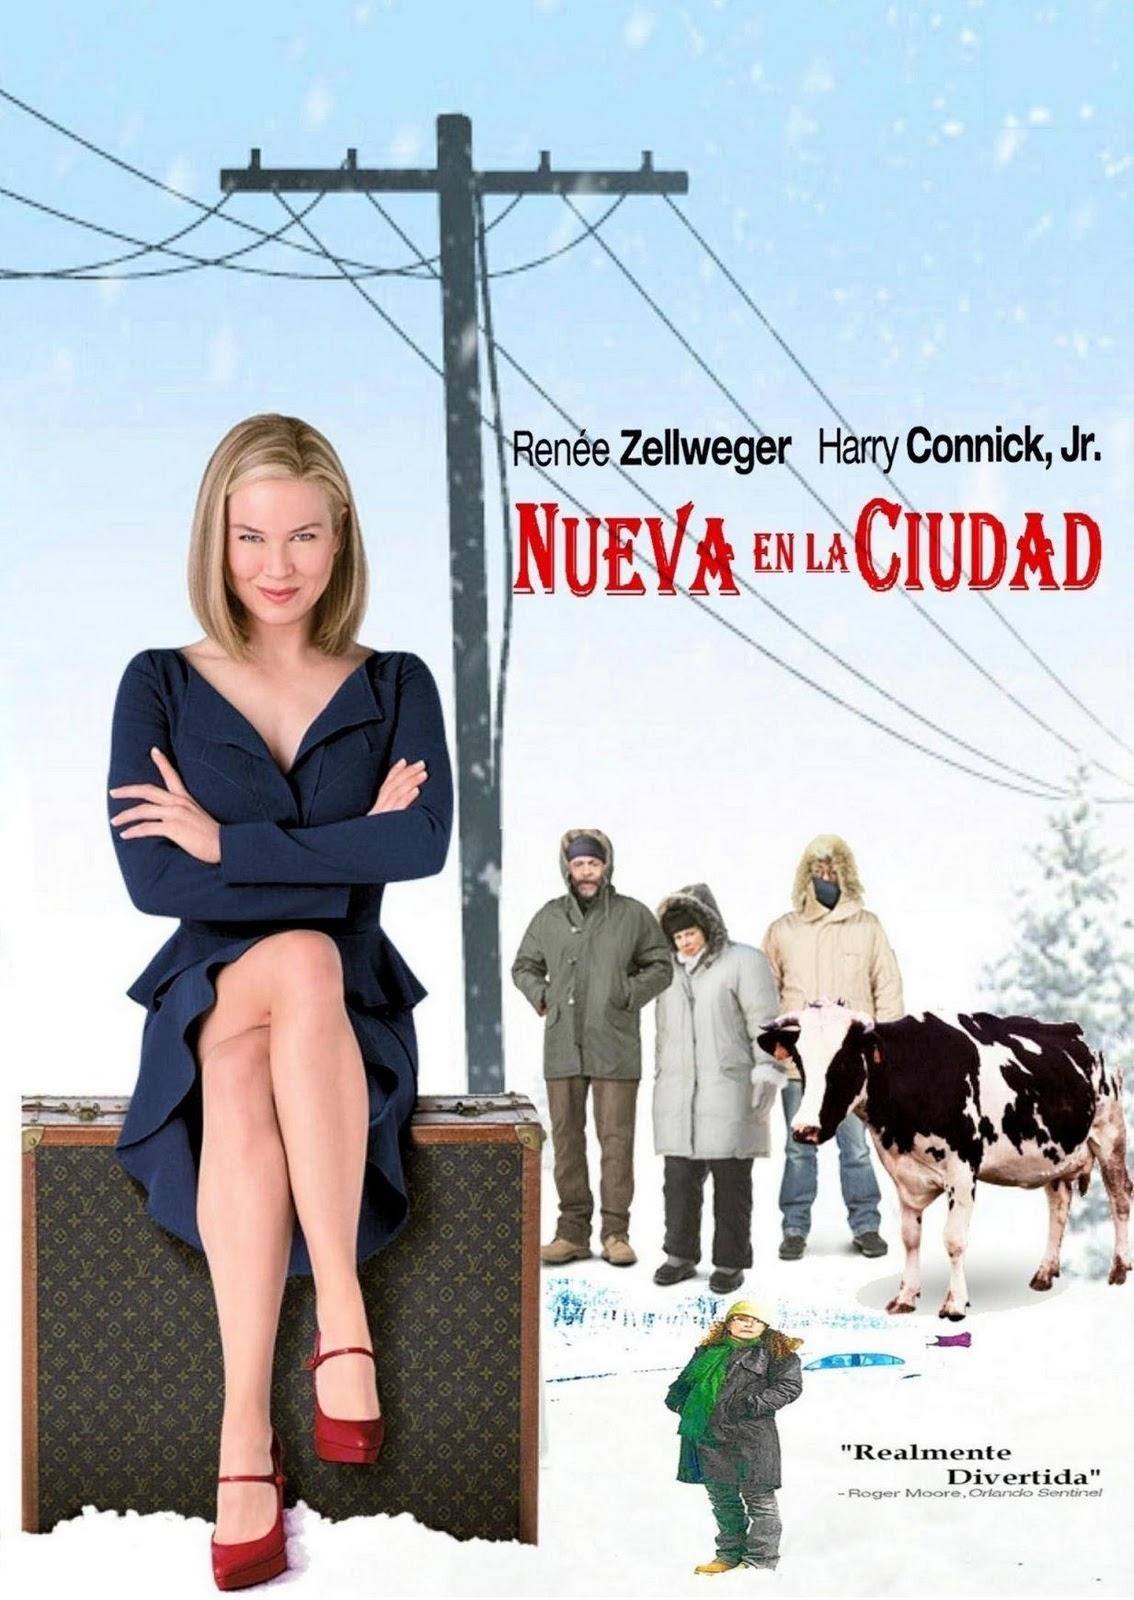 http://2.bp.blogspot.com/_2jiLNu3L5K8/TPf3J_Az1MI/AAAAAAAAADg/3tlZ1TximO8/s1600/Nueva-En-La-Ciudad-poster.jpg